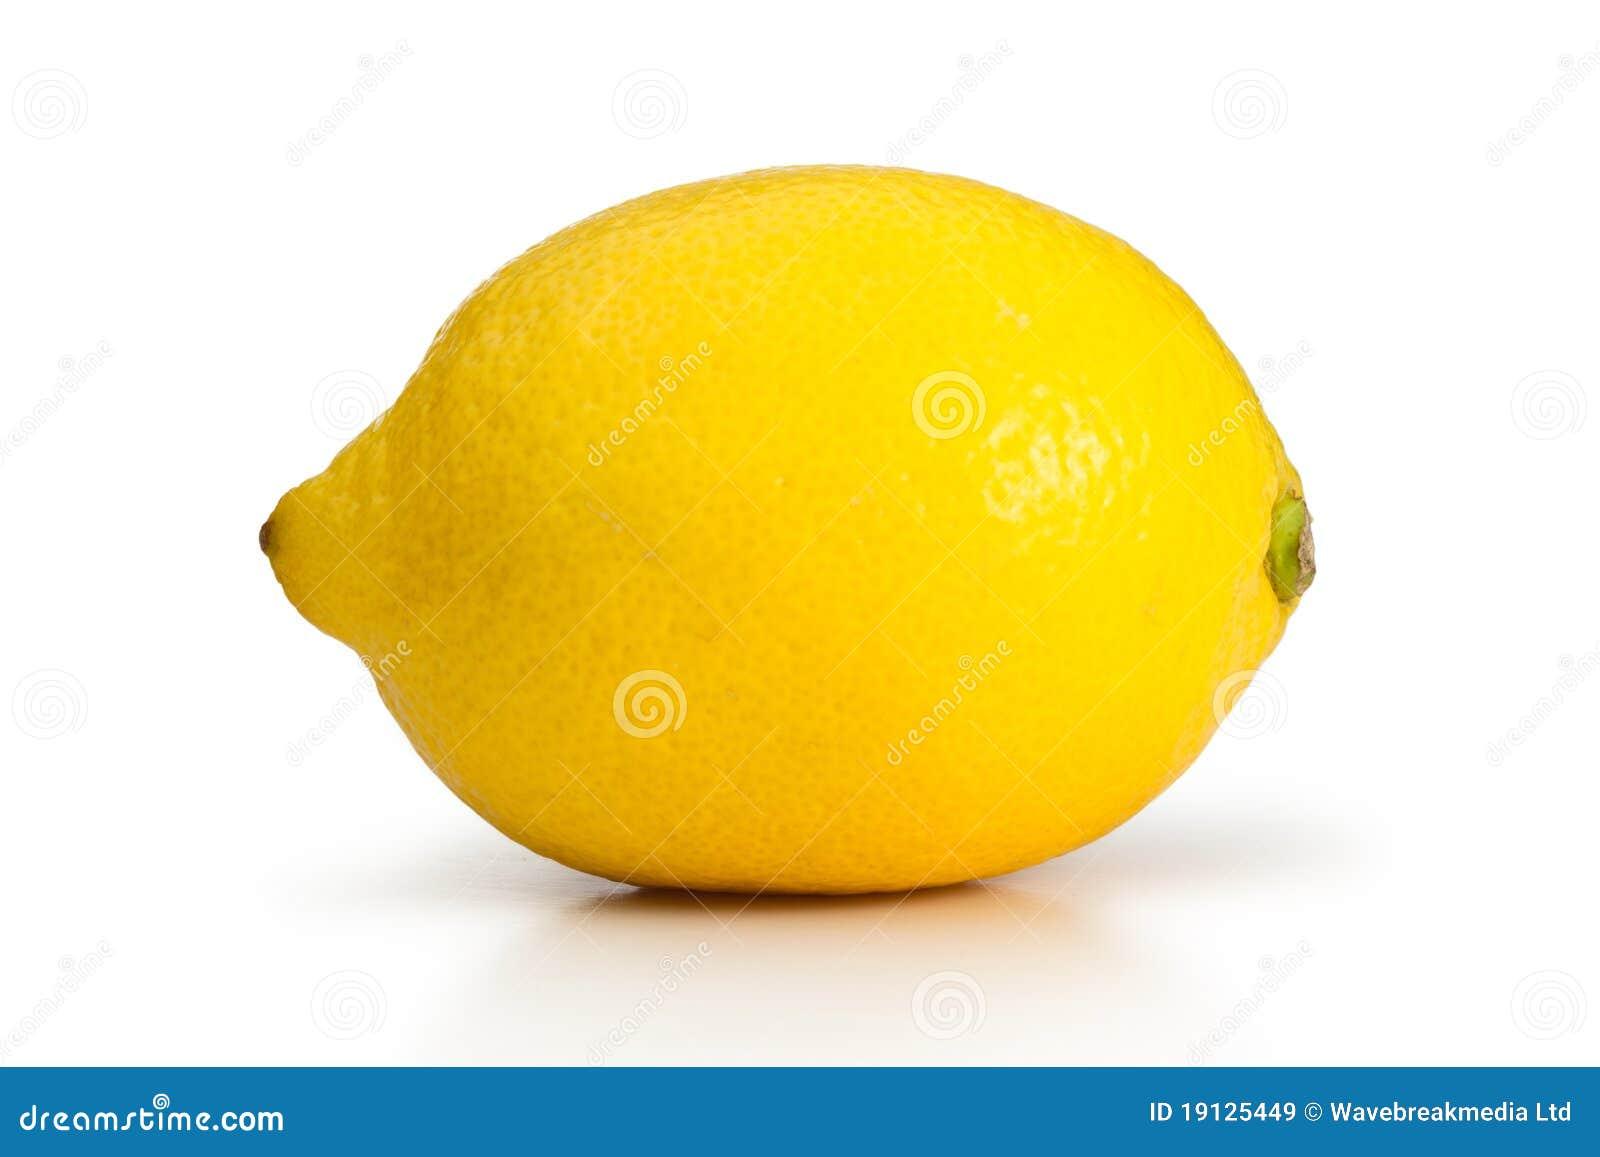 Start a Mobile Lemonade Stand Business